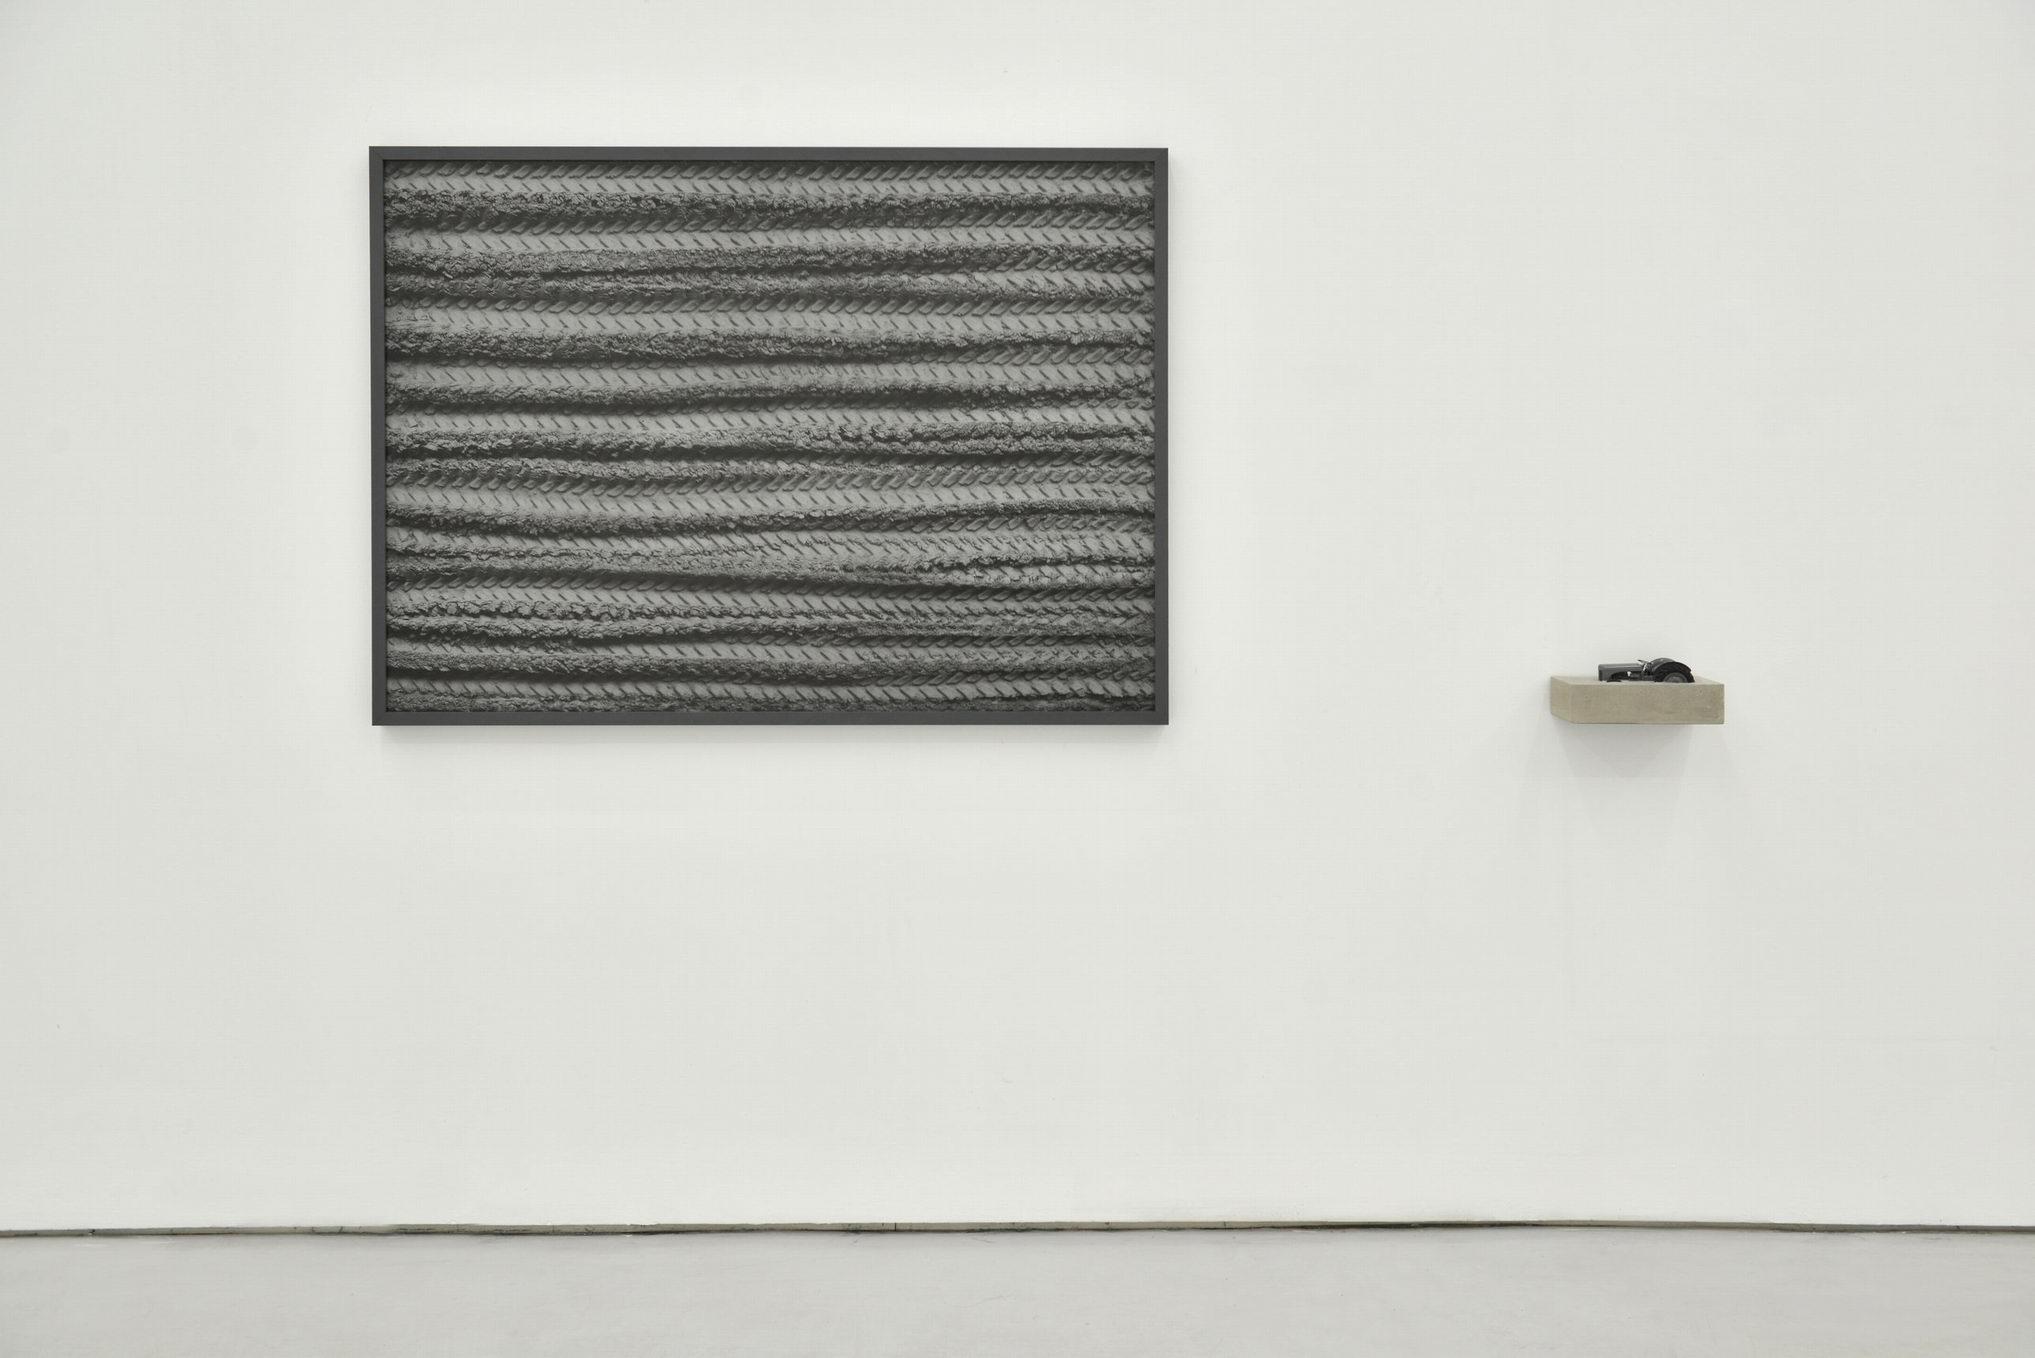 Gao Lei 高磊, N-117, 2013, Photo concrete and tractor model 摄影、水泥、拖拉机模型, 116 x 85 cm/ 28 x 15 x 12 cm